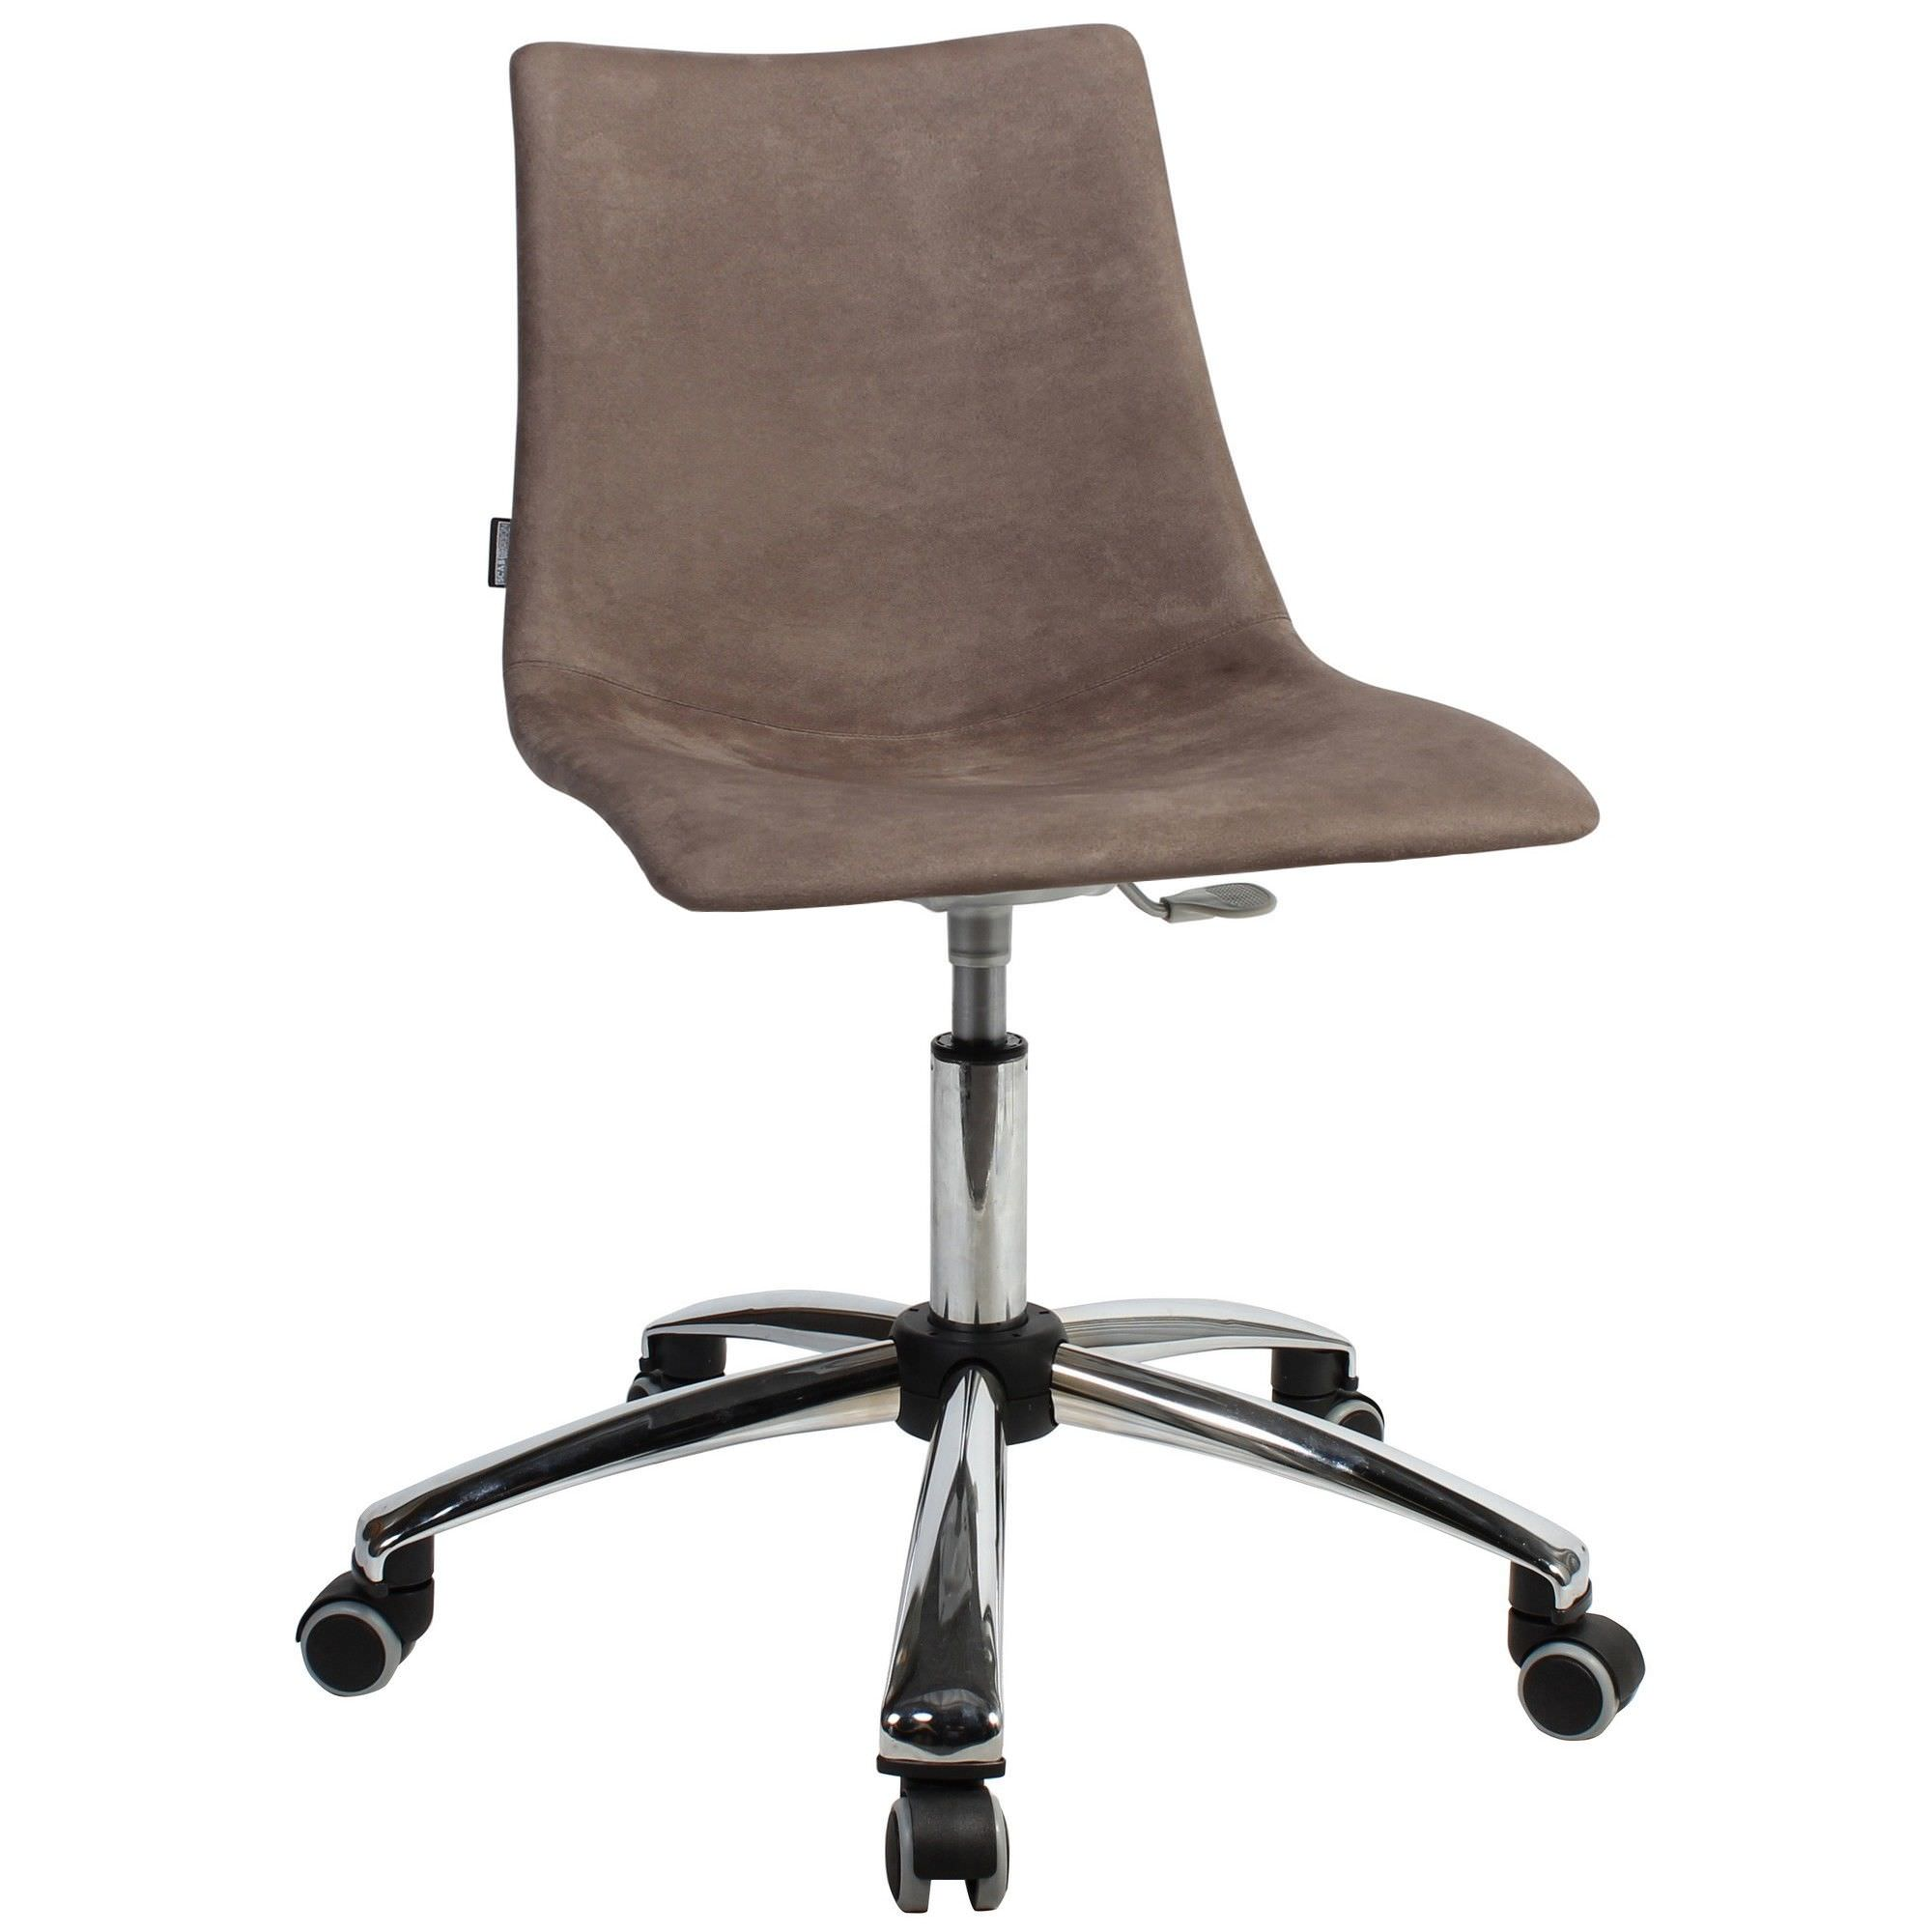 Zebra Pop Italian Made Commercial Grade Gas Lift Fabric Office Chair, Brown